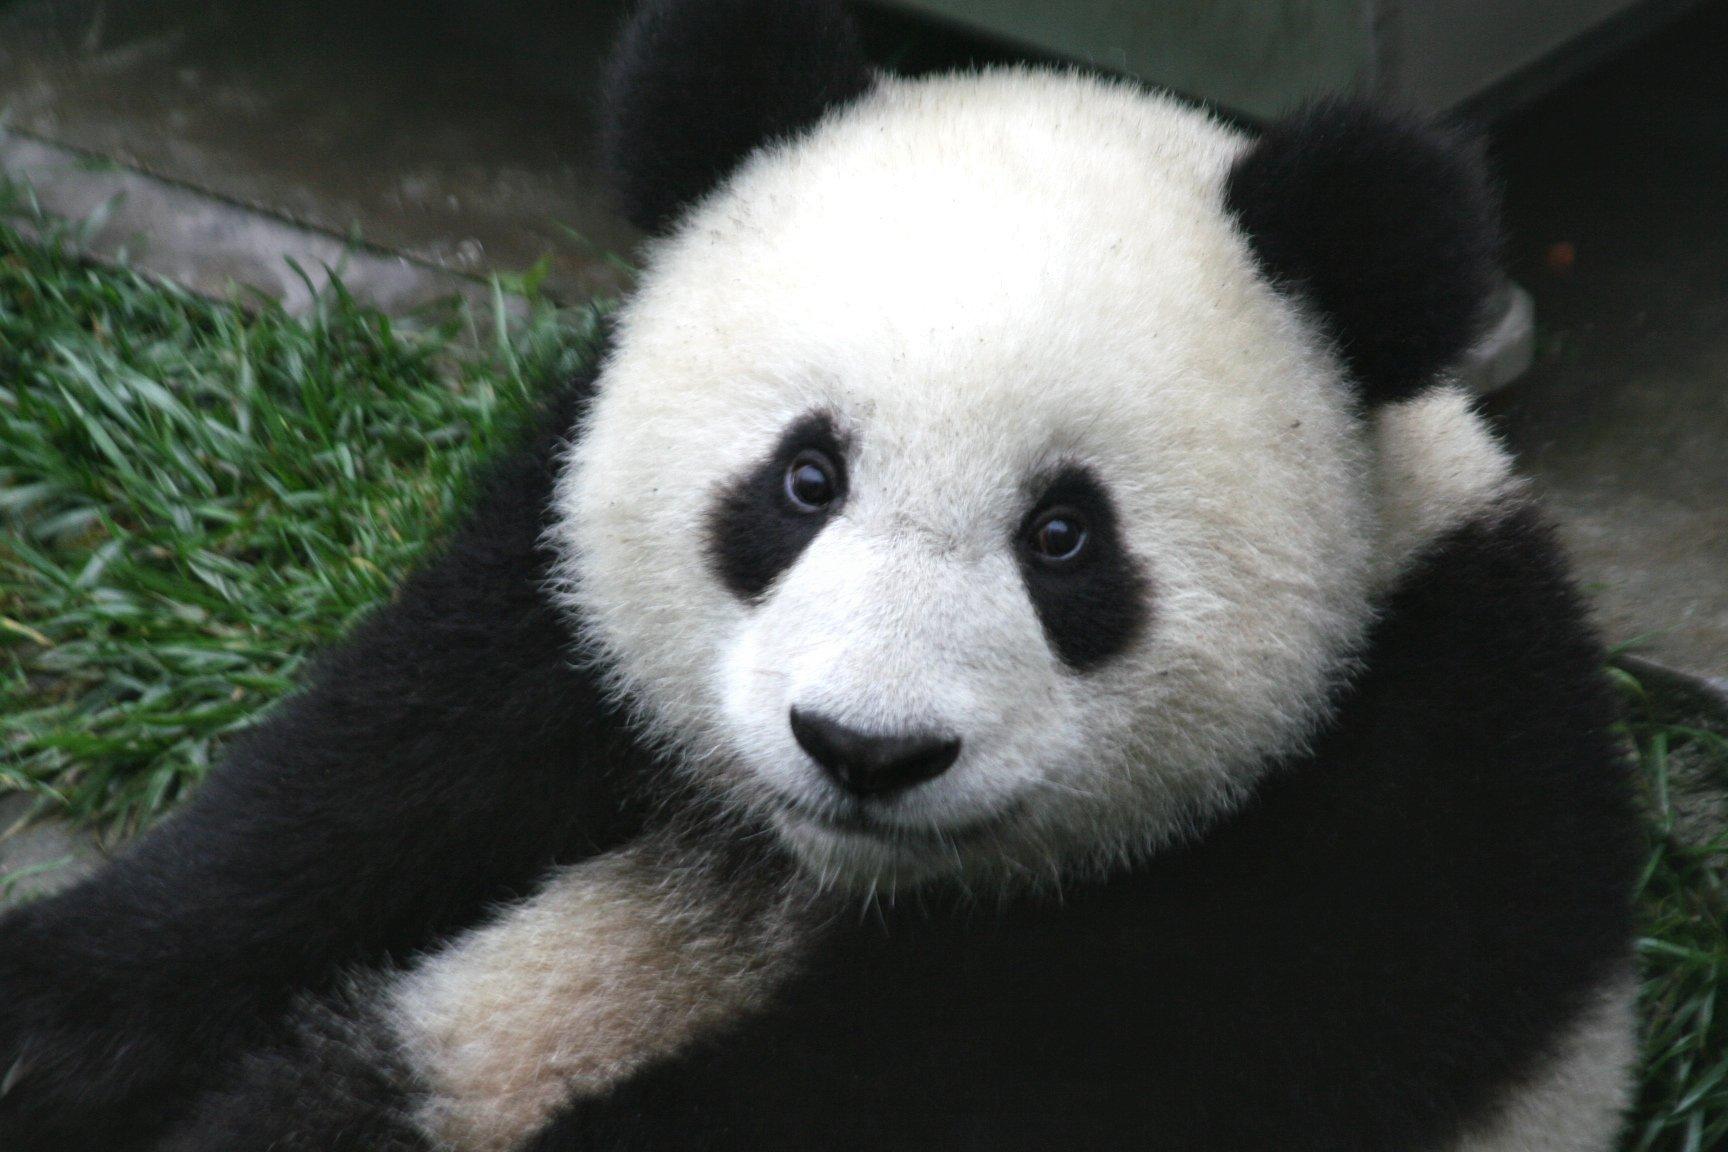 A panda sat on its backside looking at the camera